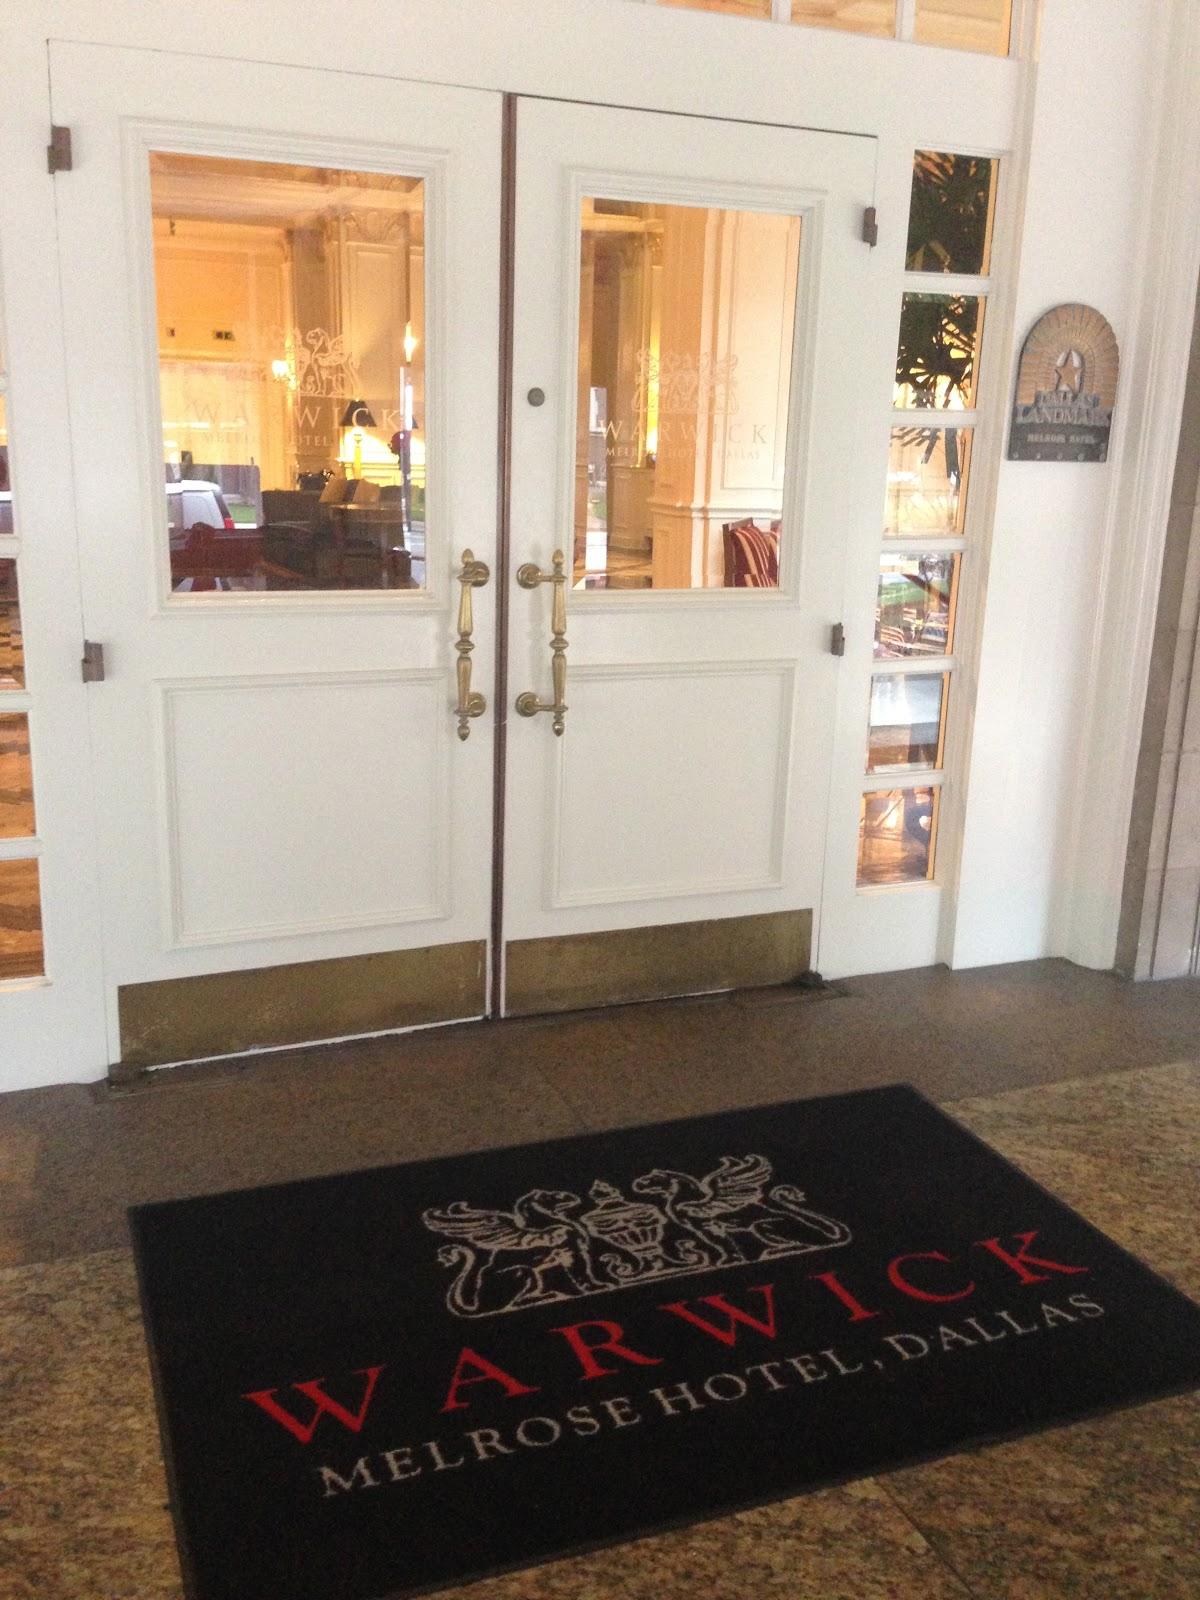 taste of hawaii warwick melrose hotel dallas texas. Black Bedroom Furniture Sets. Home Design Ideas